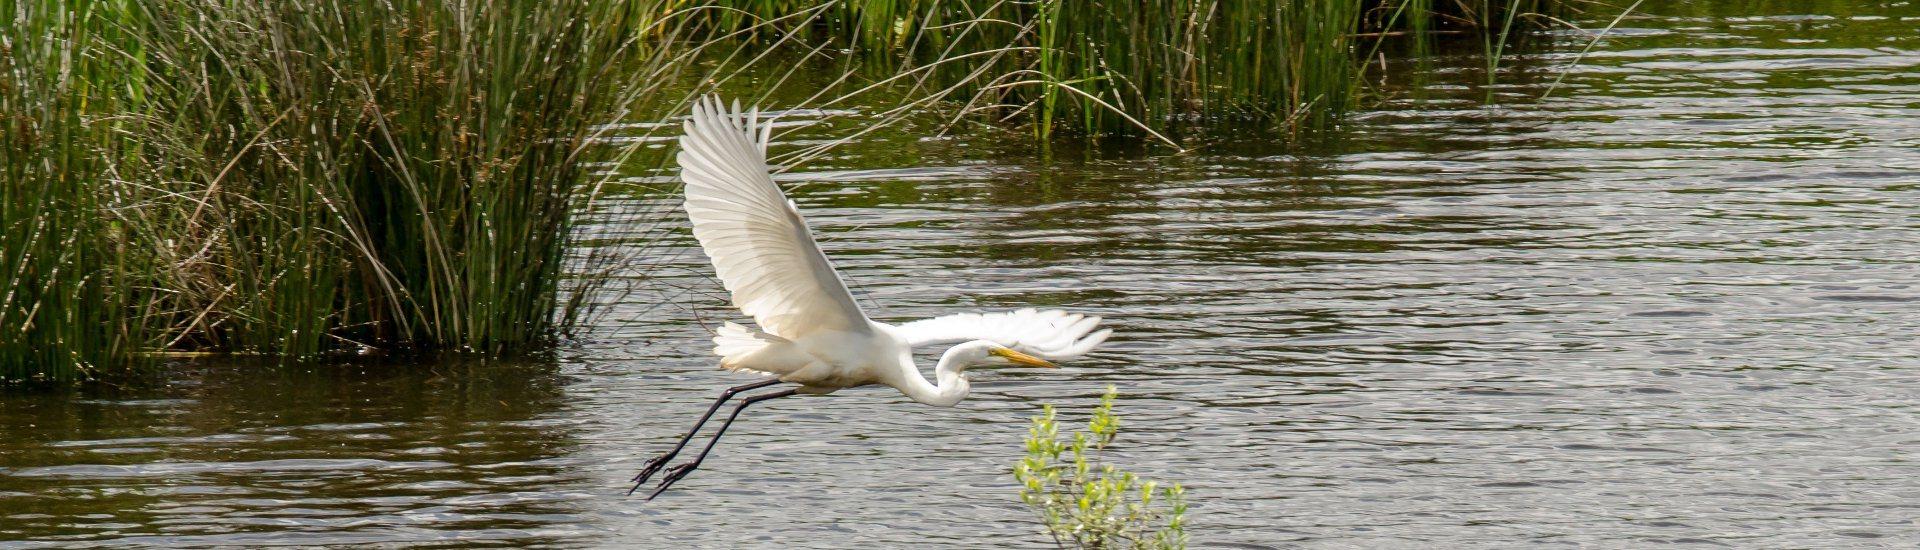 The Pascagoula River Audubon Center